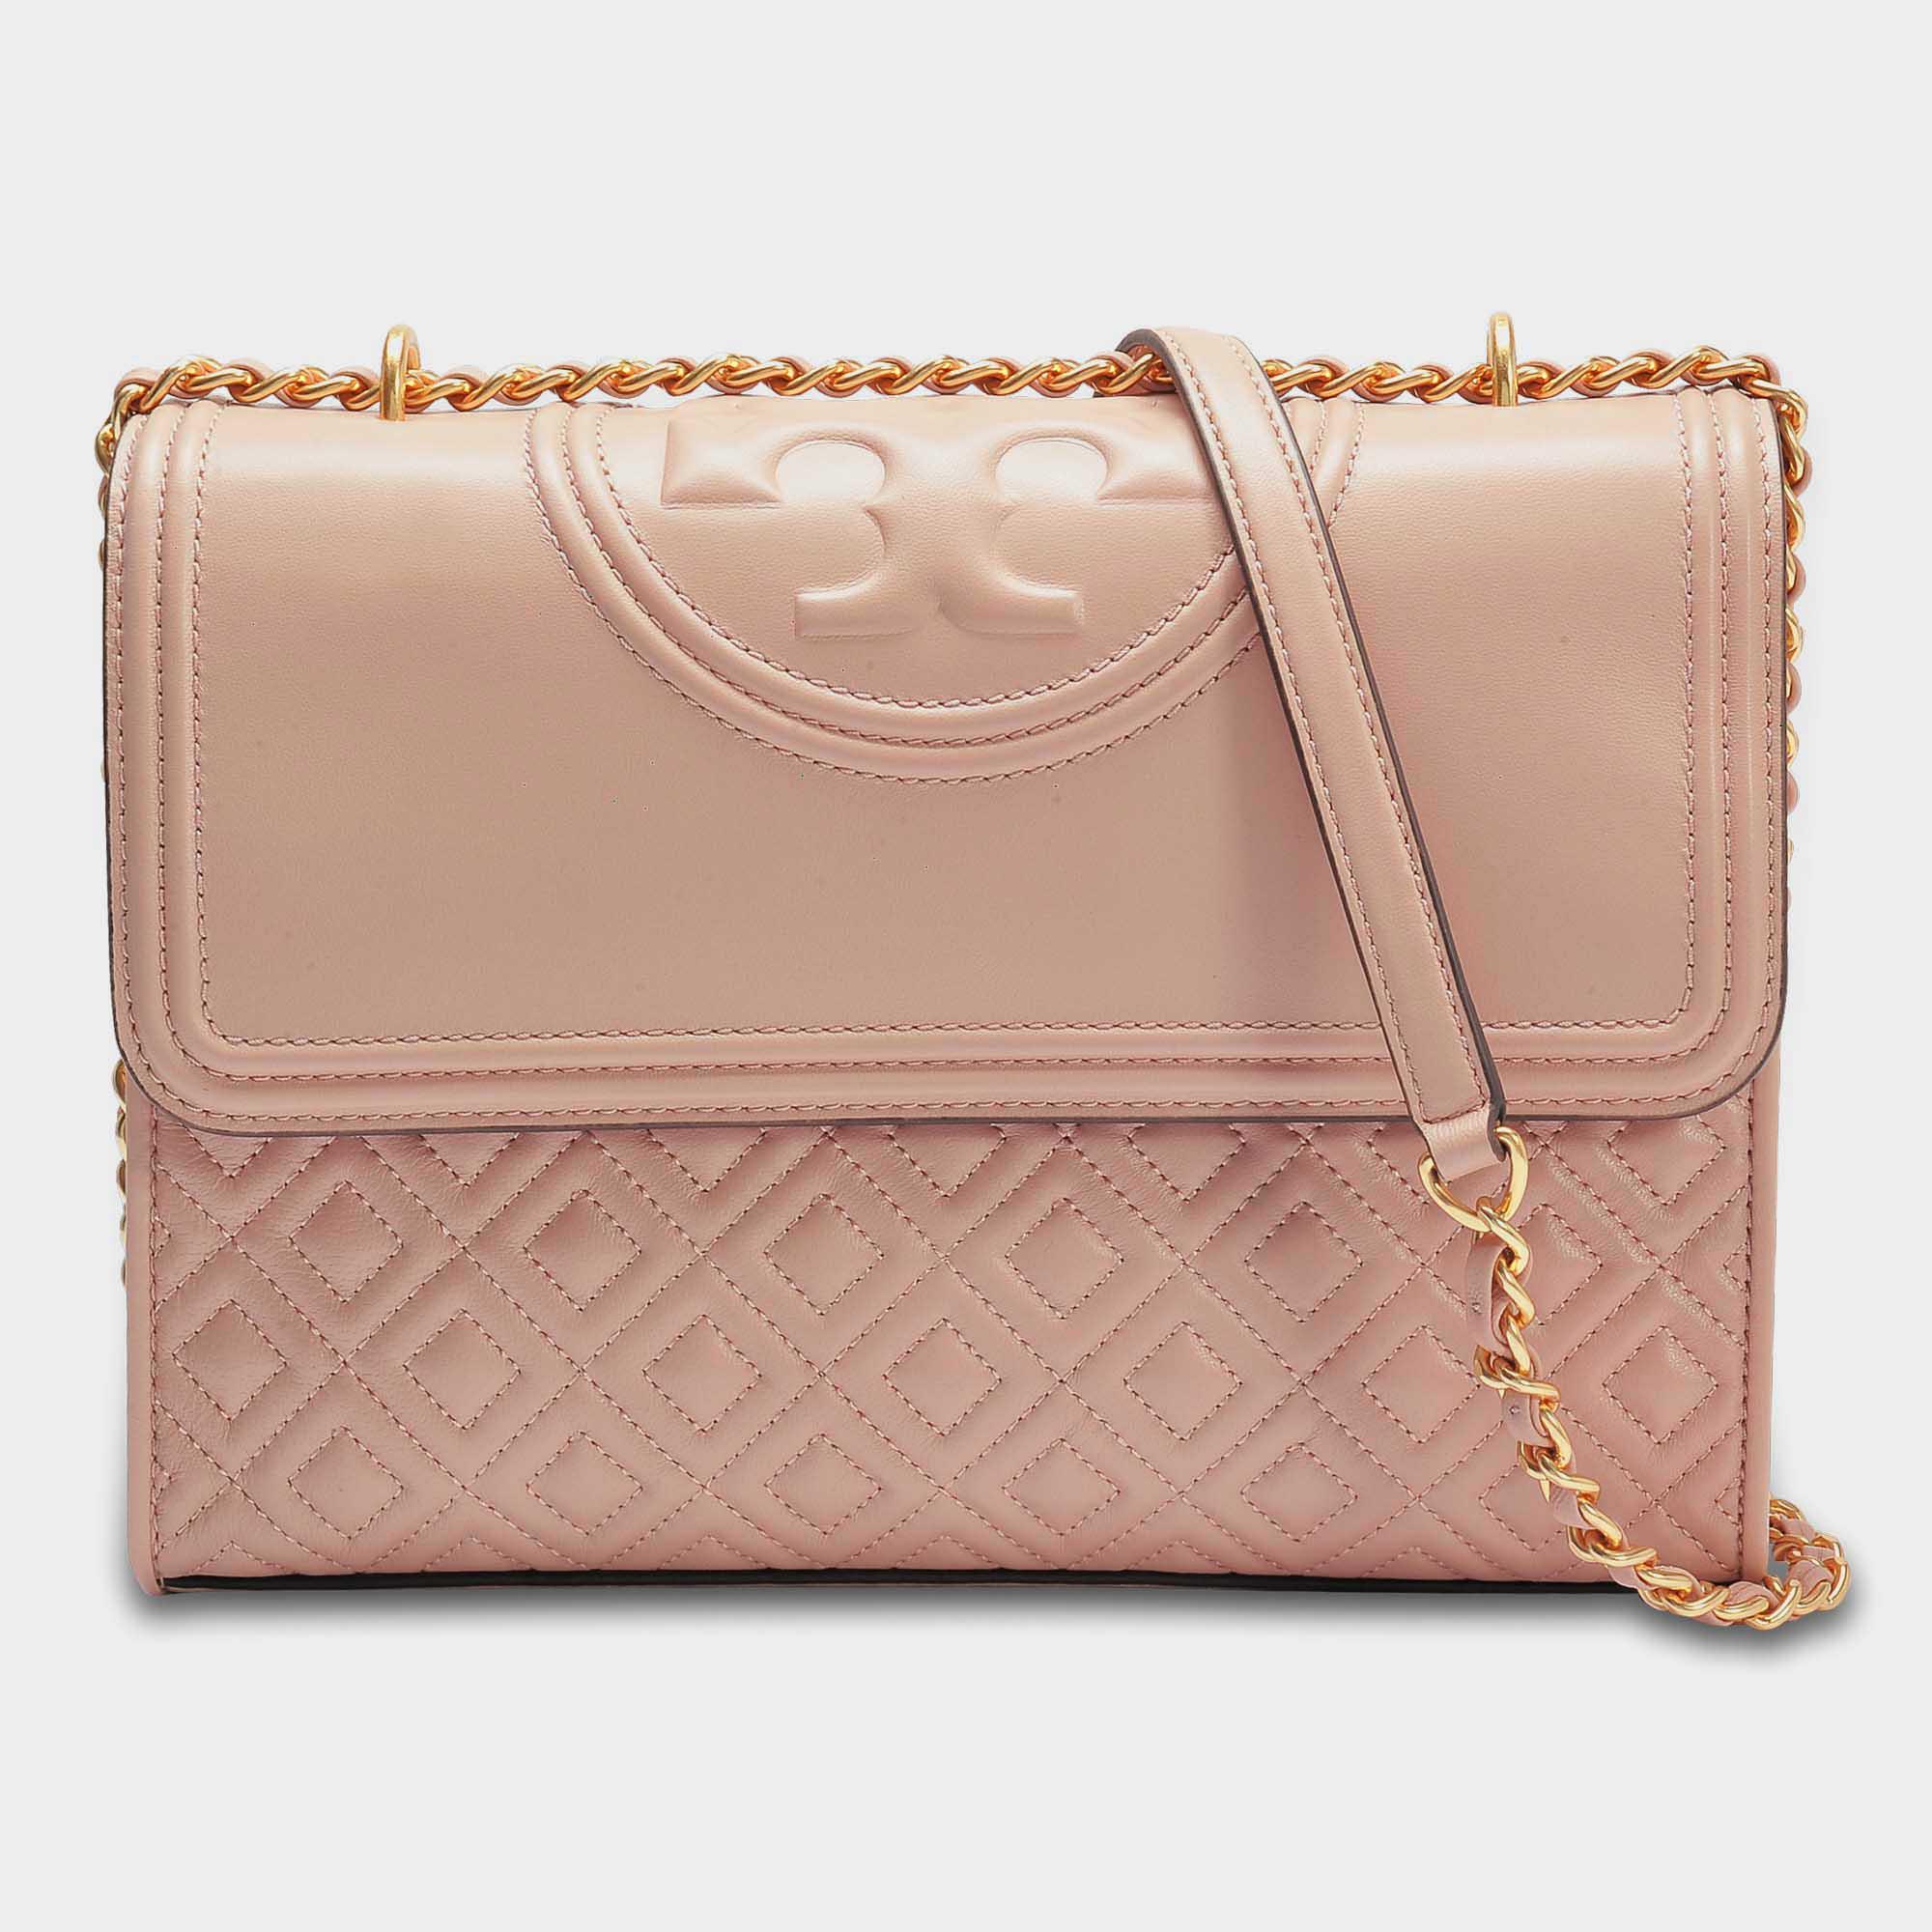 480169c520c Tory Burch Fleming Convertible Shoulder Bag In Mink Lambskin Leather ...